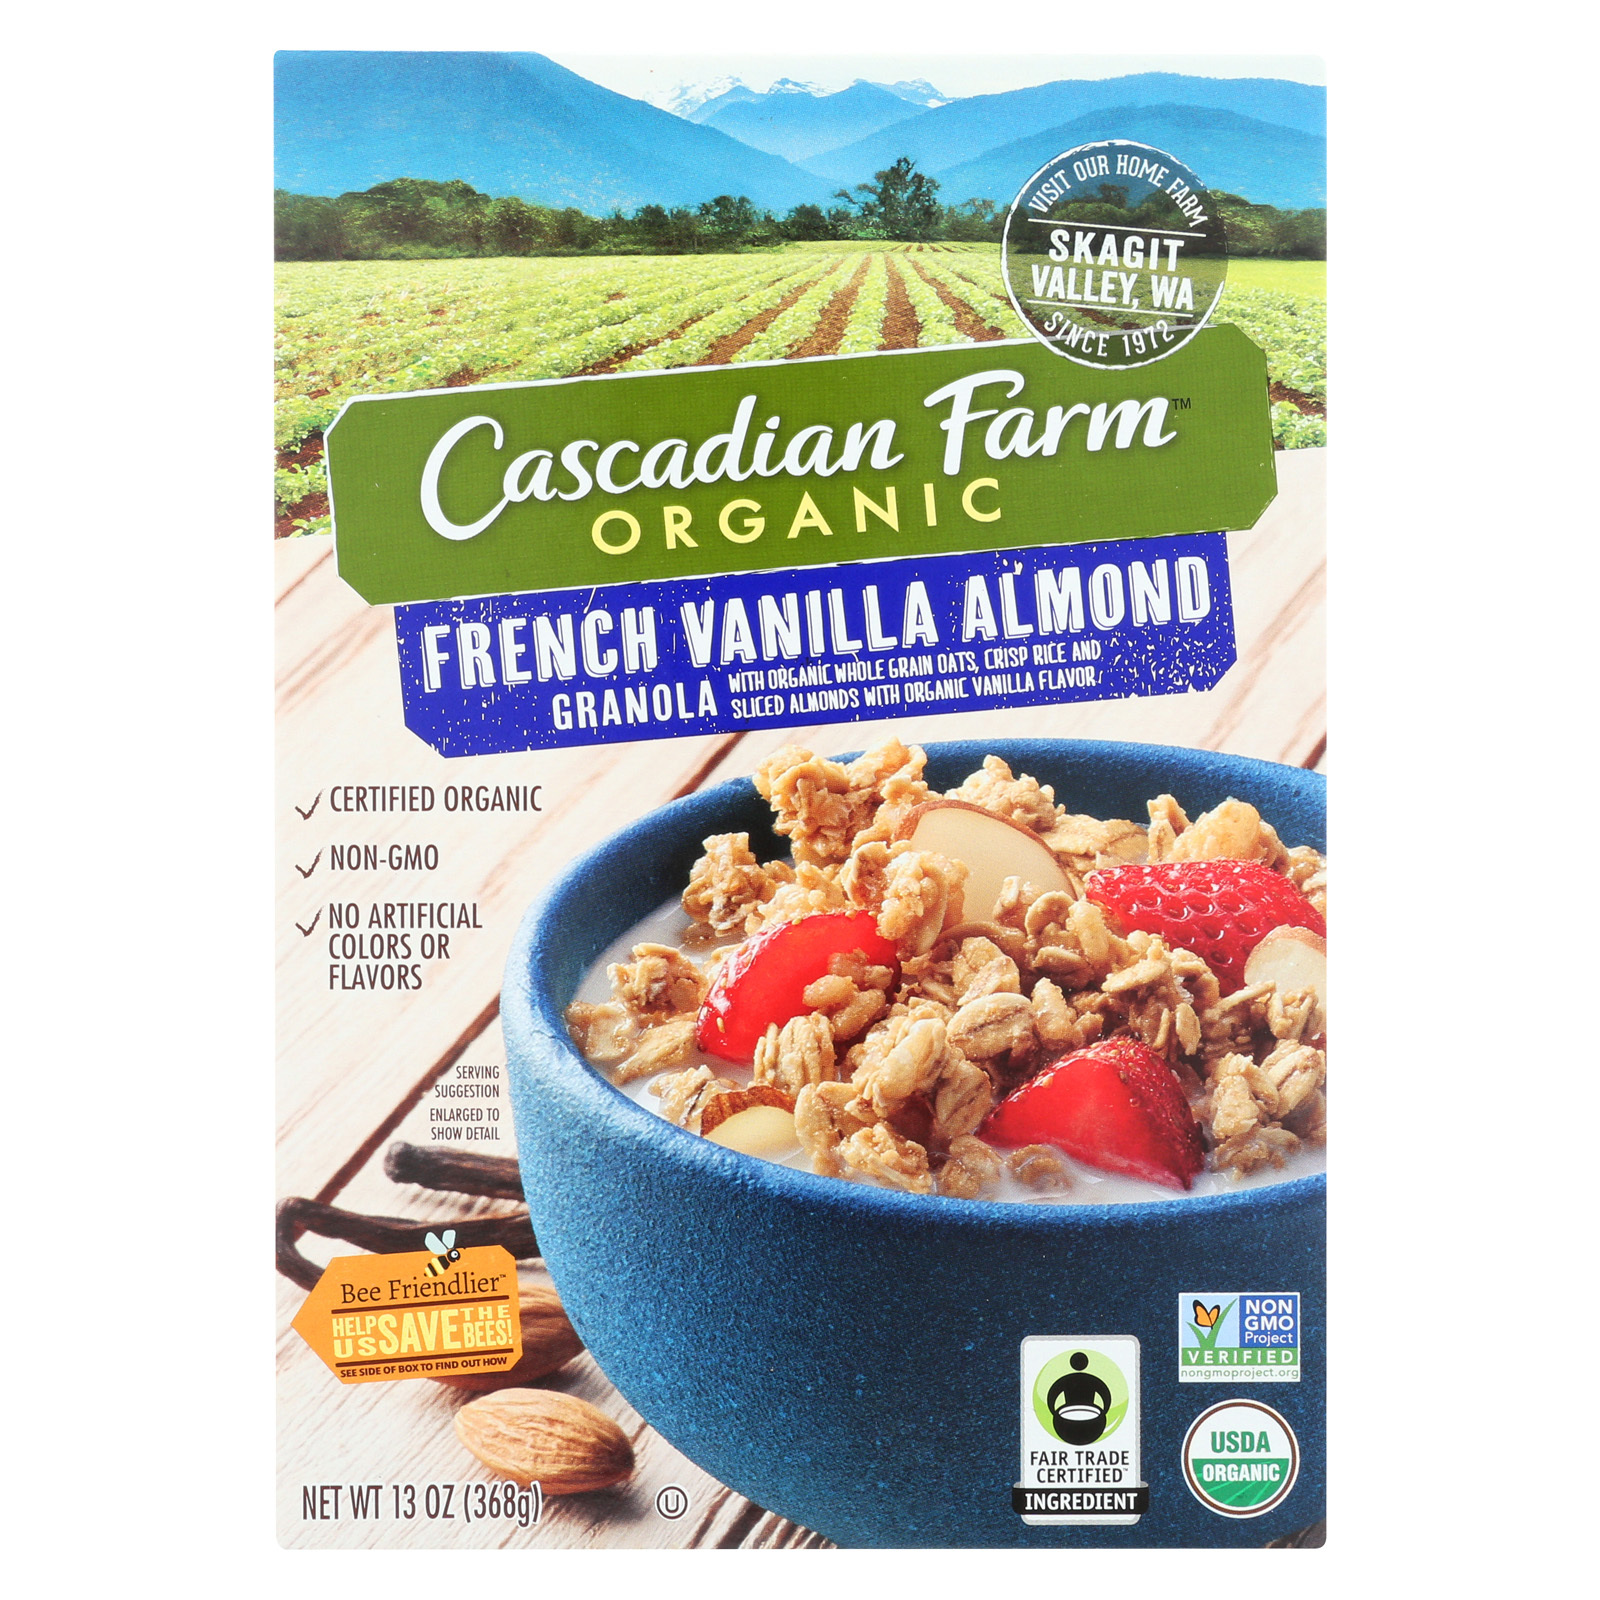 Cascadian Farm Organic Granola - French Vanilla Almond - Case of 6 - 13 oz.